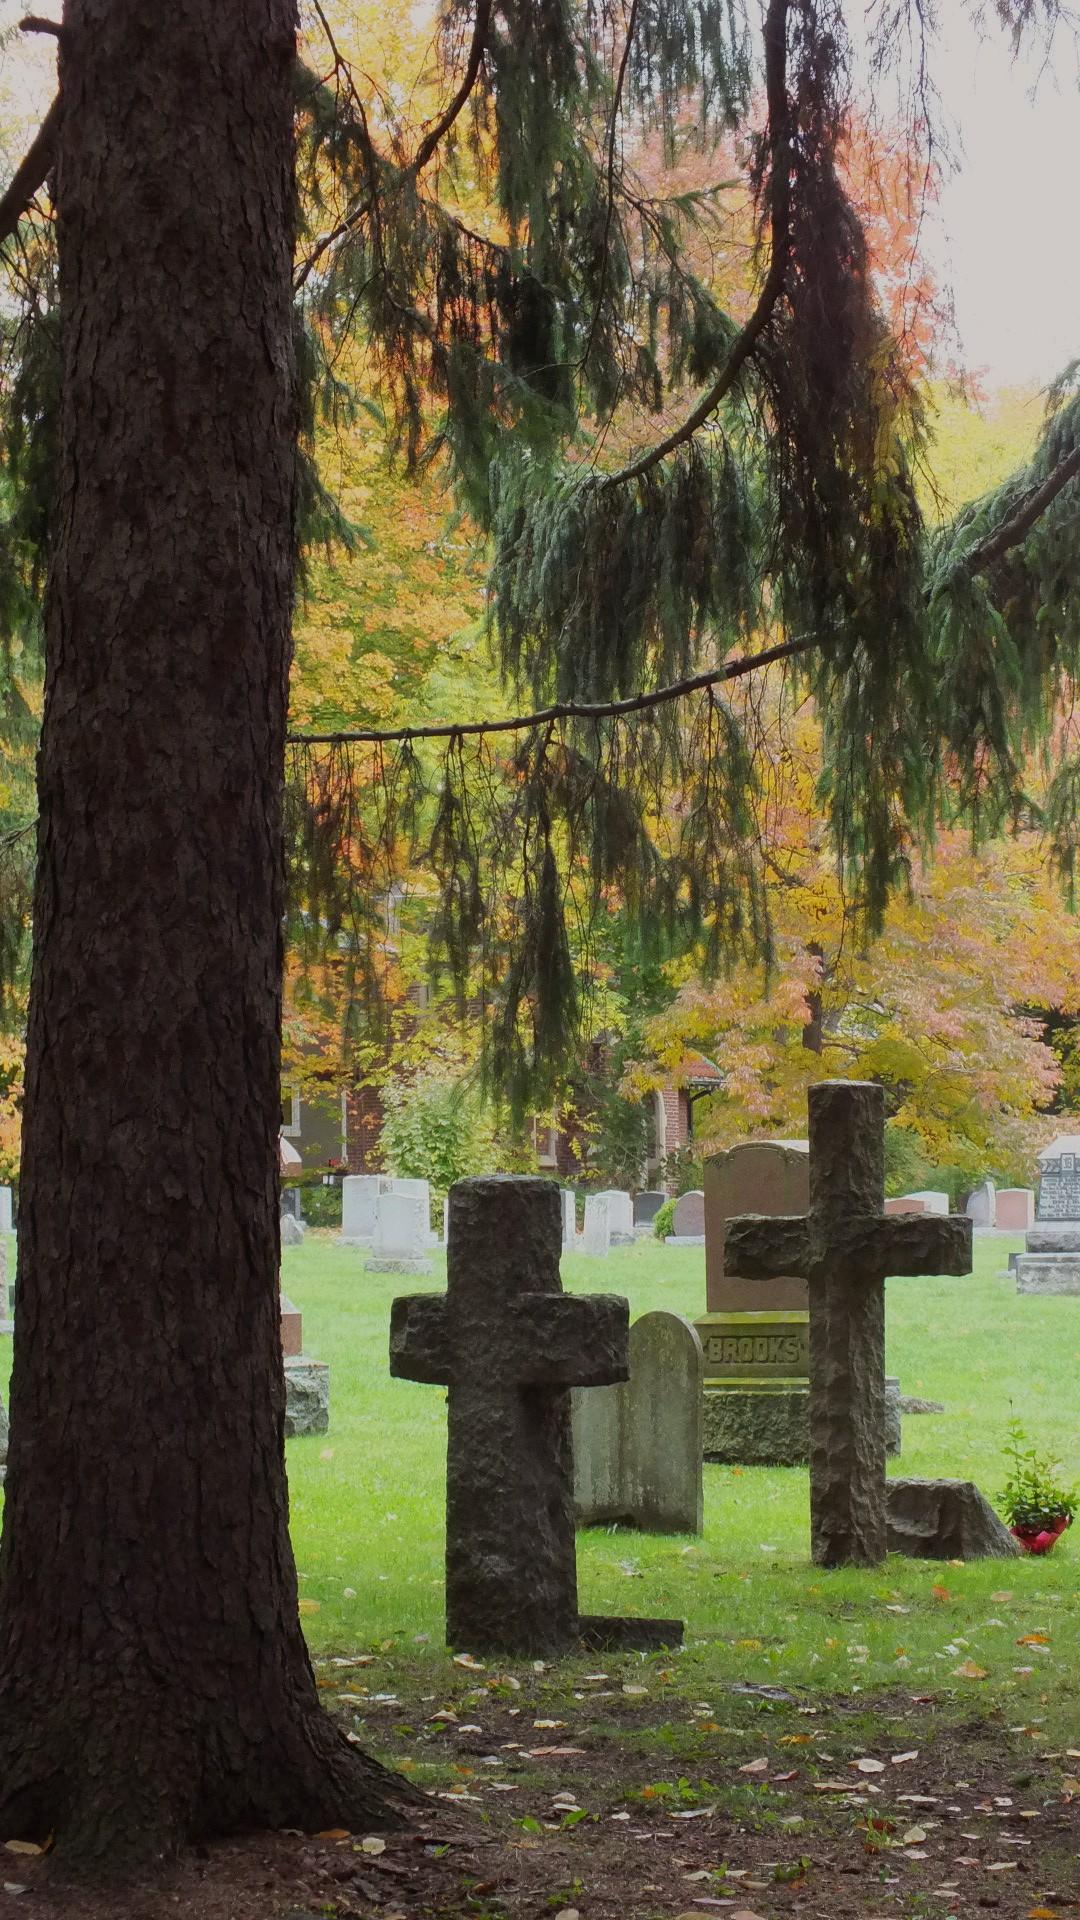 St. Thomas' Cemetery